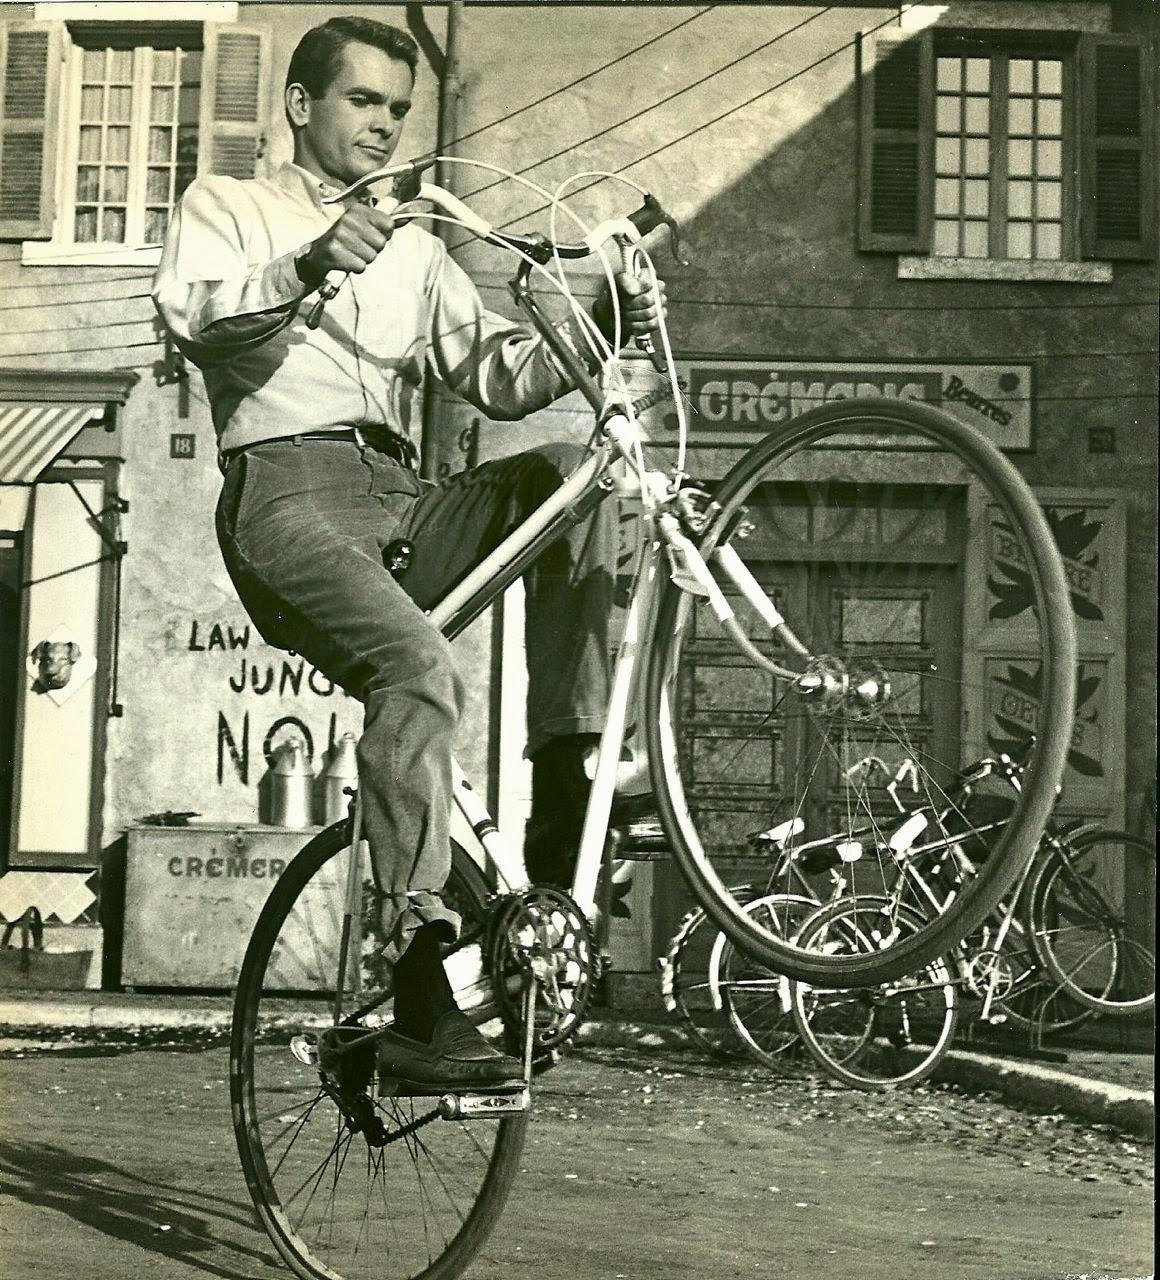 Dean Jones Wheelies A Bike 1967 Vintage Everyday